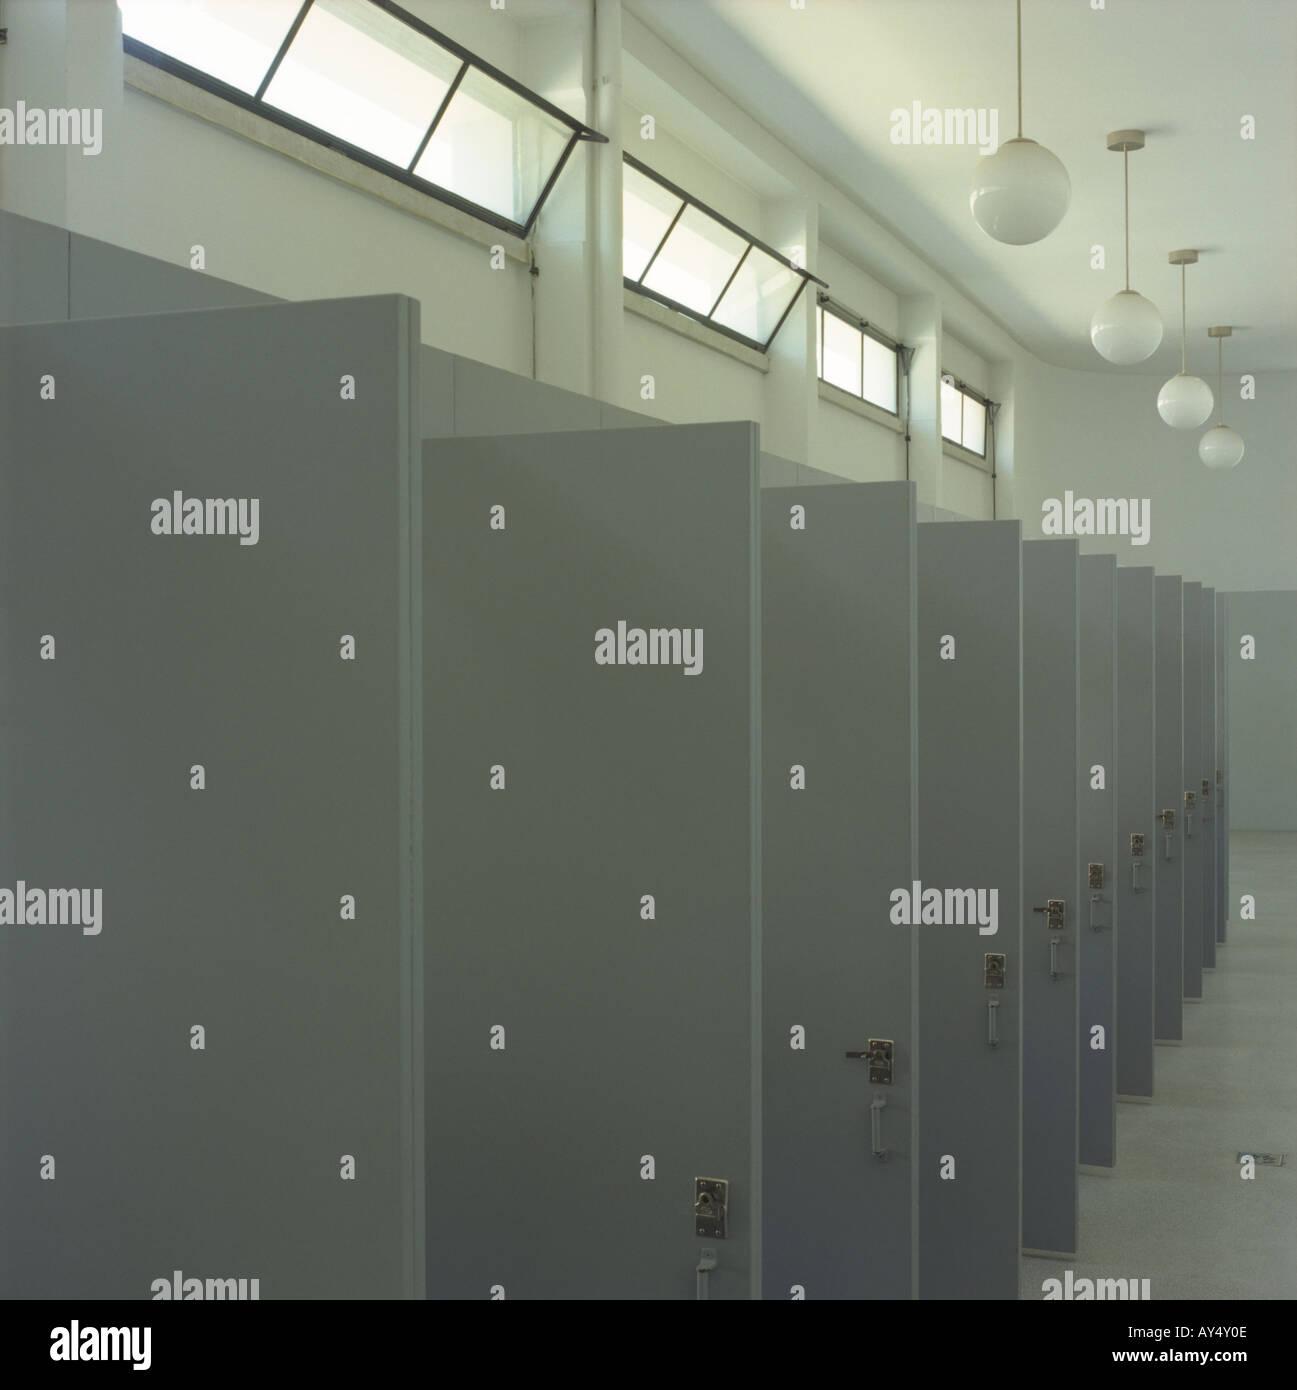 long series of doors of toilets in a school - Stock Image